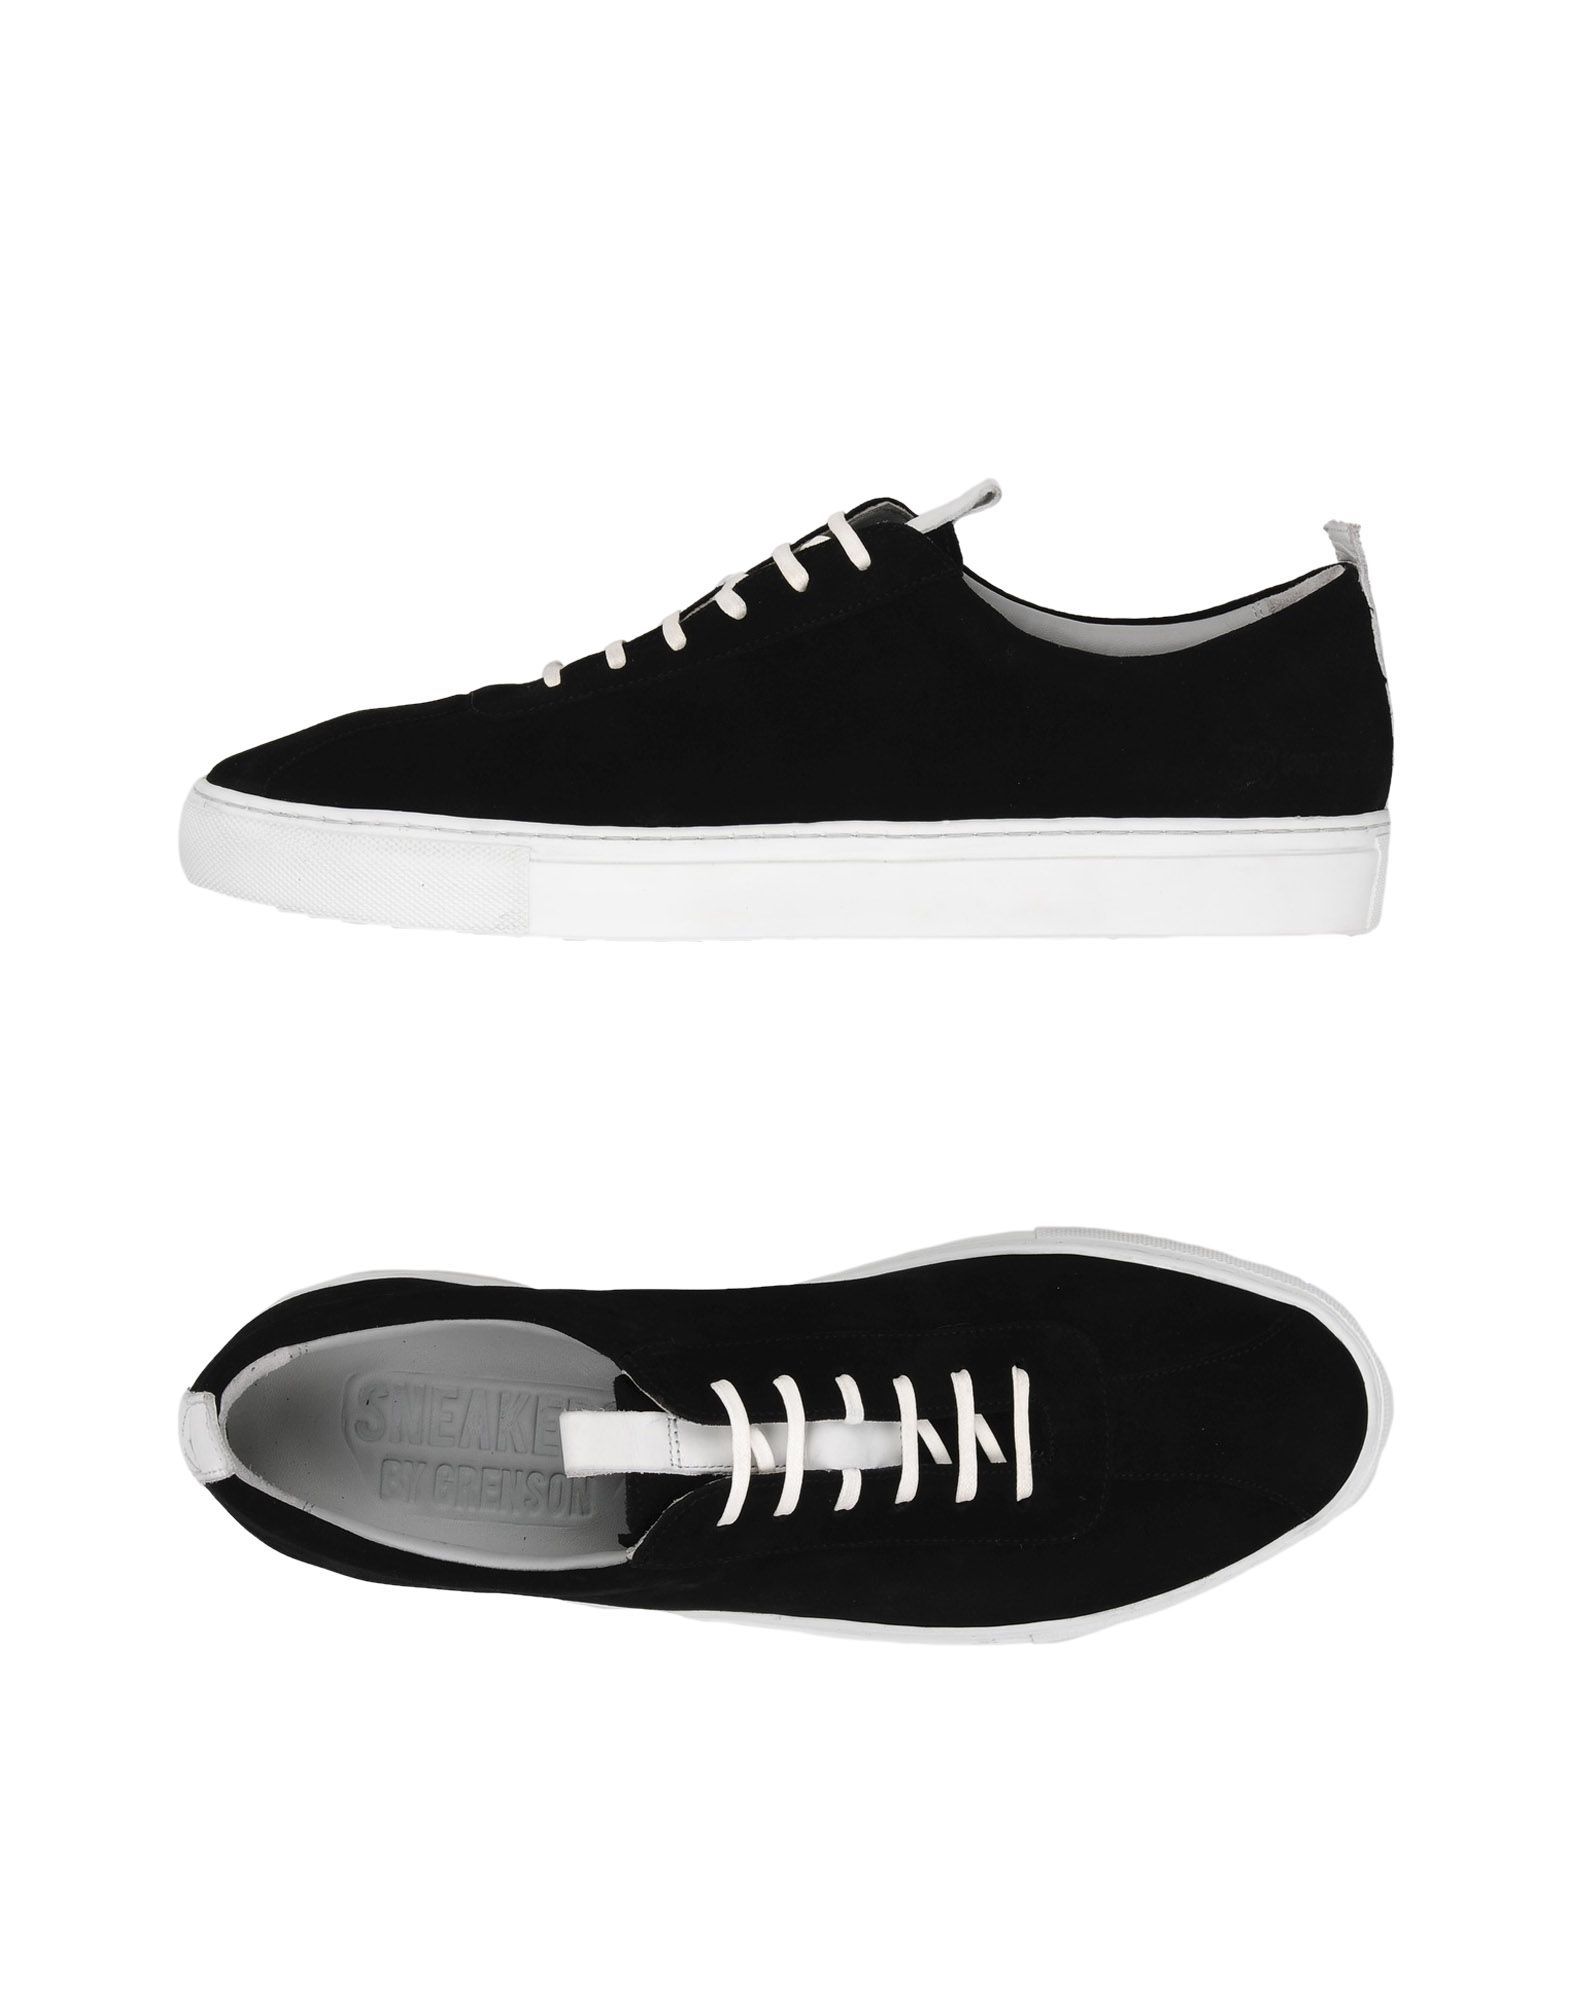 Sneakers Grenson G Sneaker 1 Black - Uomo - Acquista online su